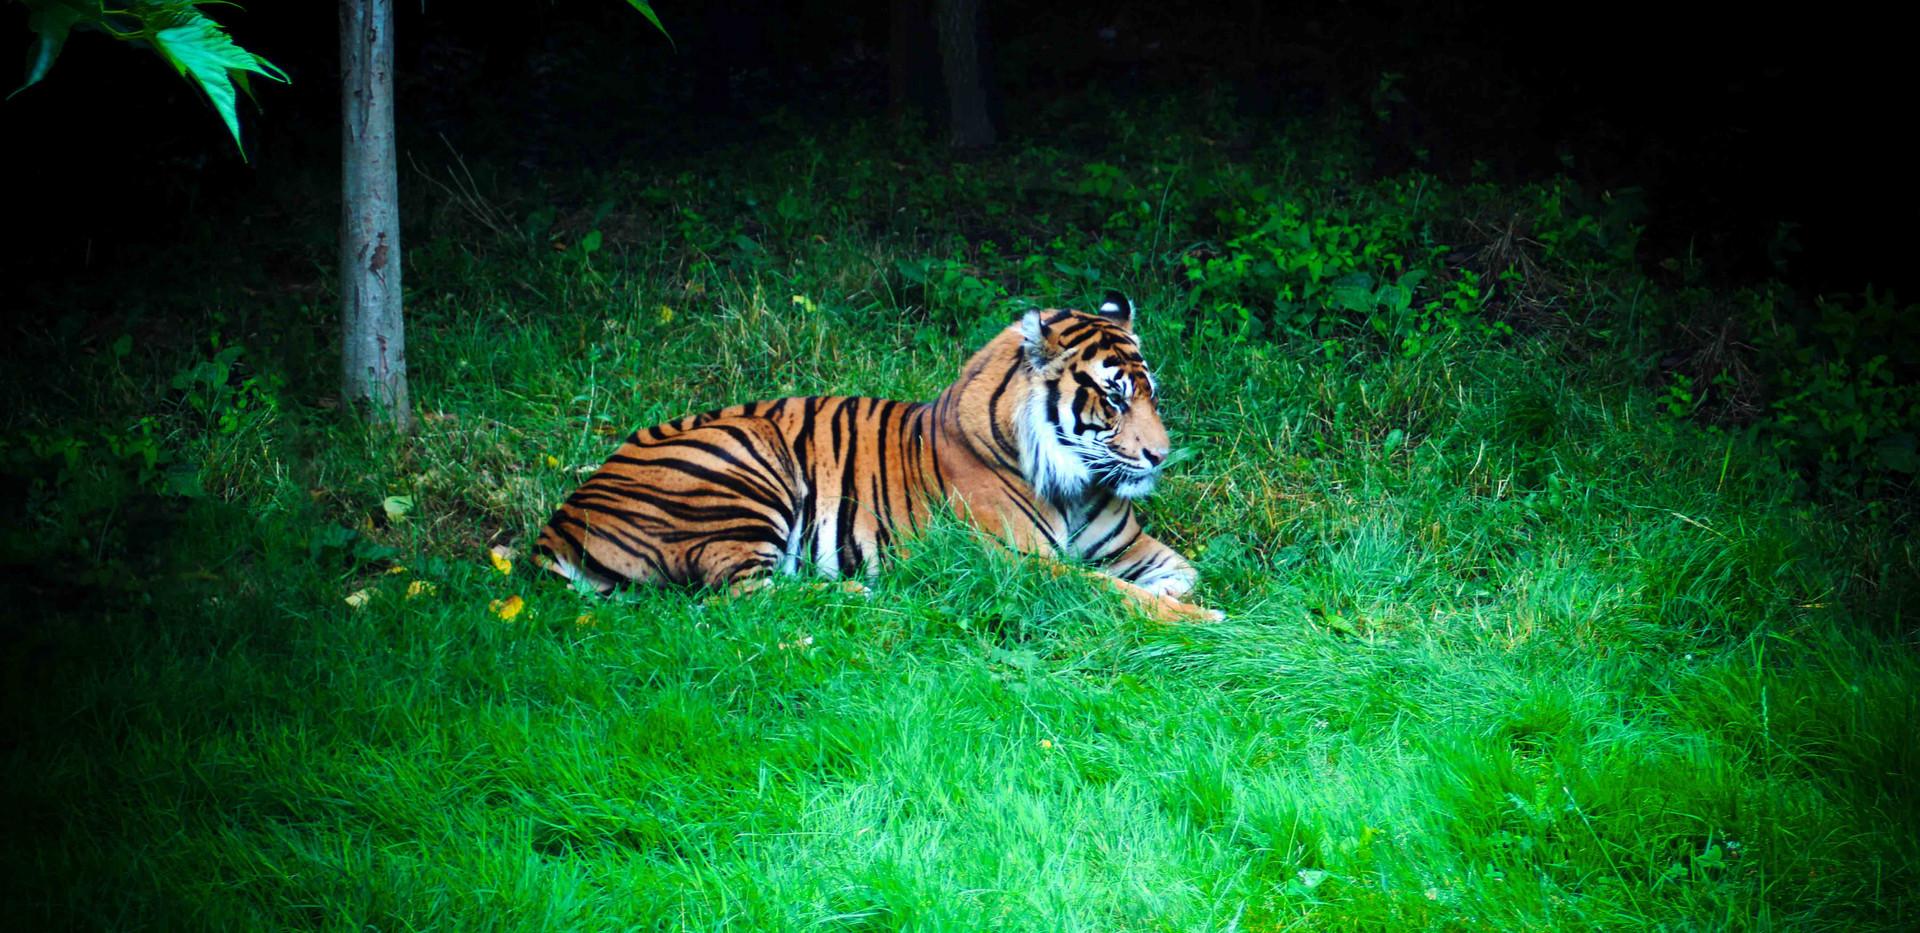 Sumatran Tiger in ZSL London Zoo